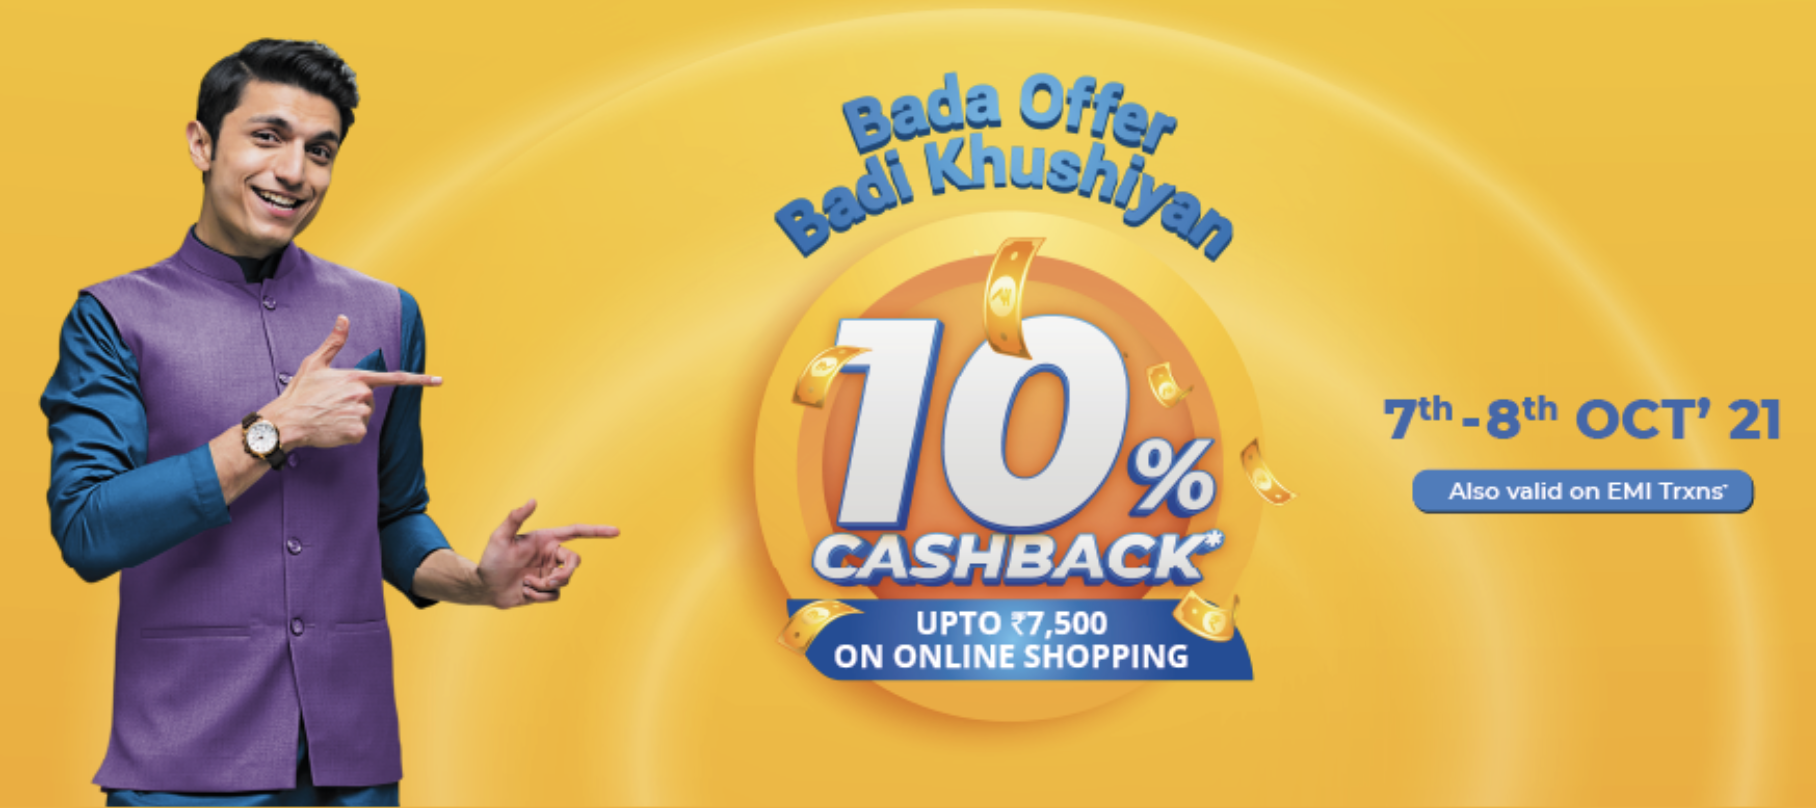 SBICard Cashback offer - round 2